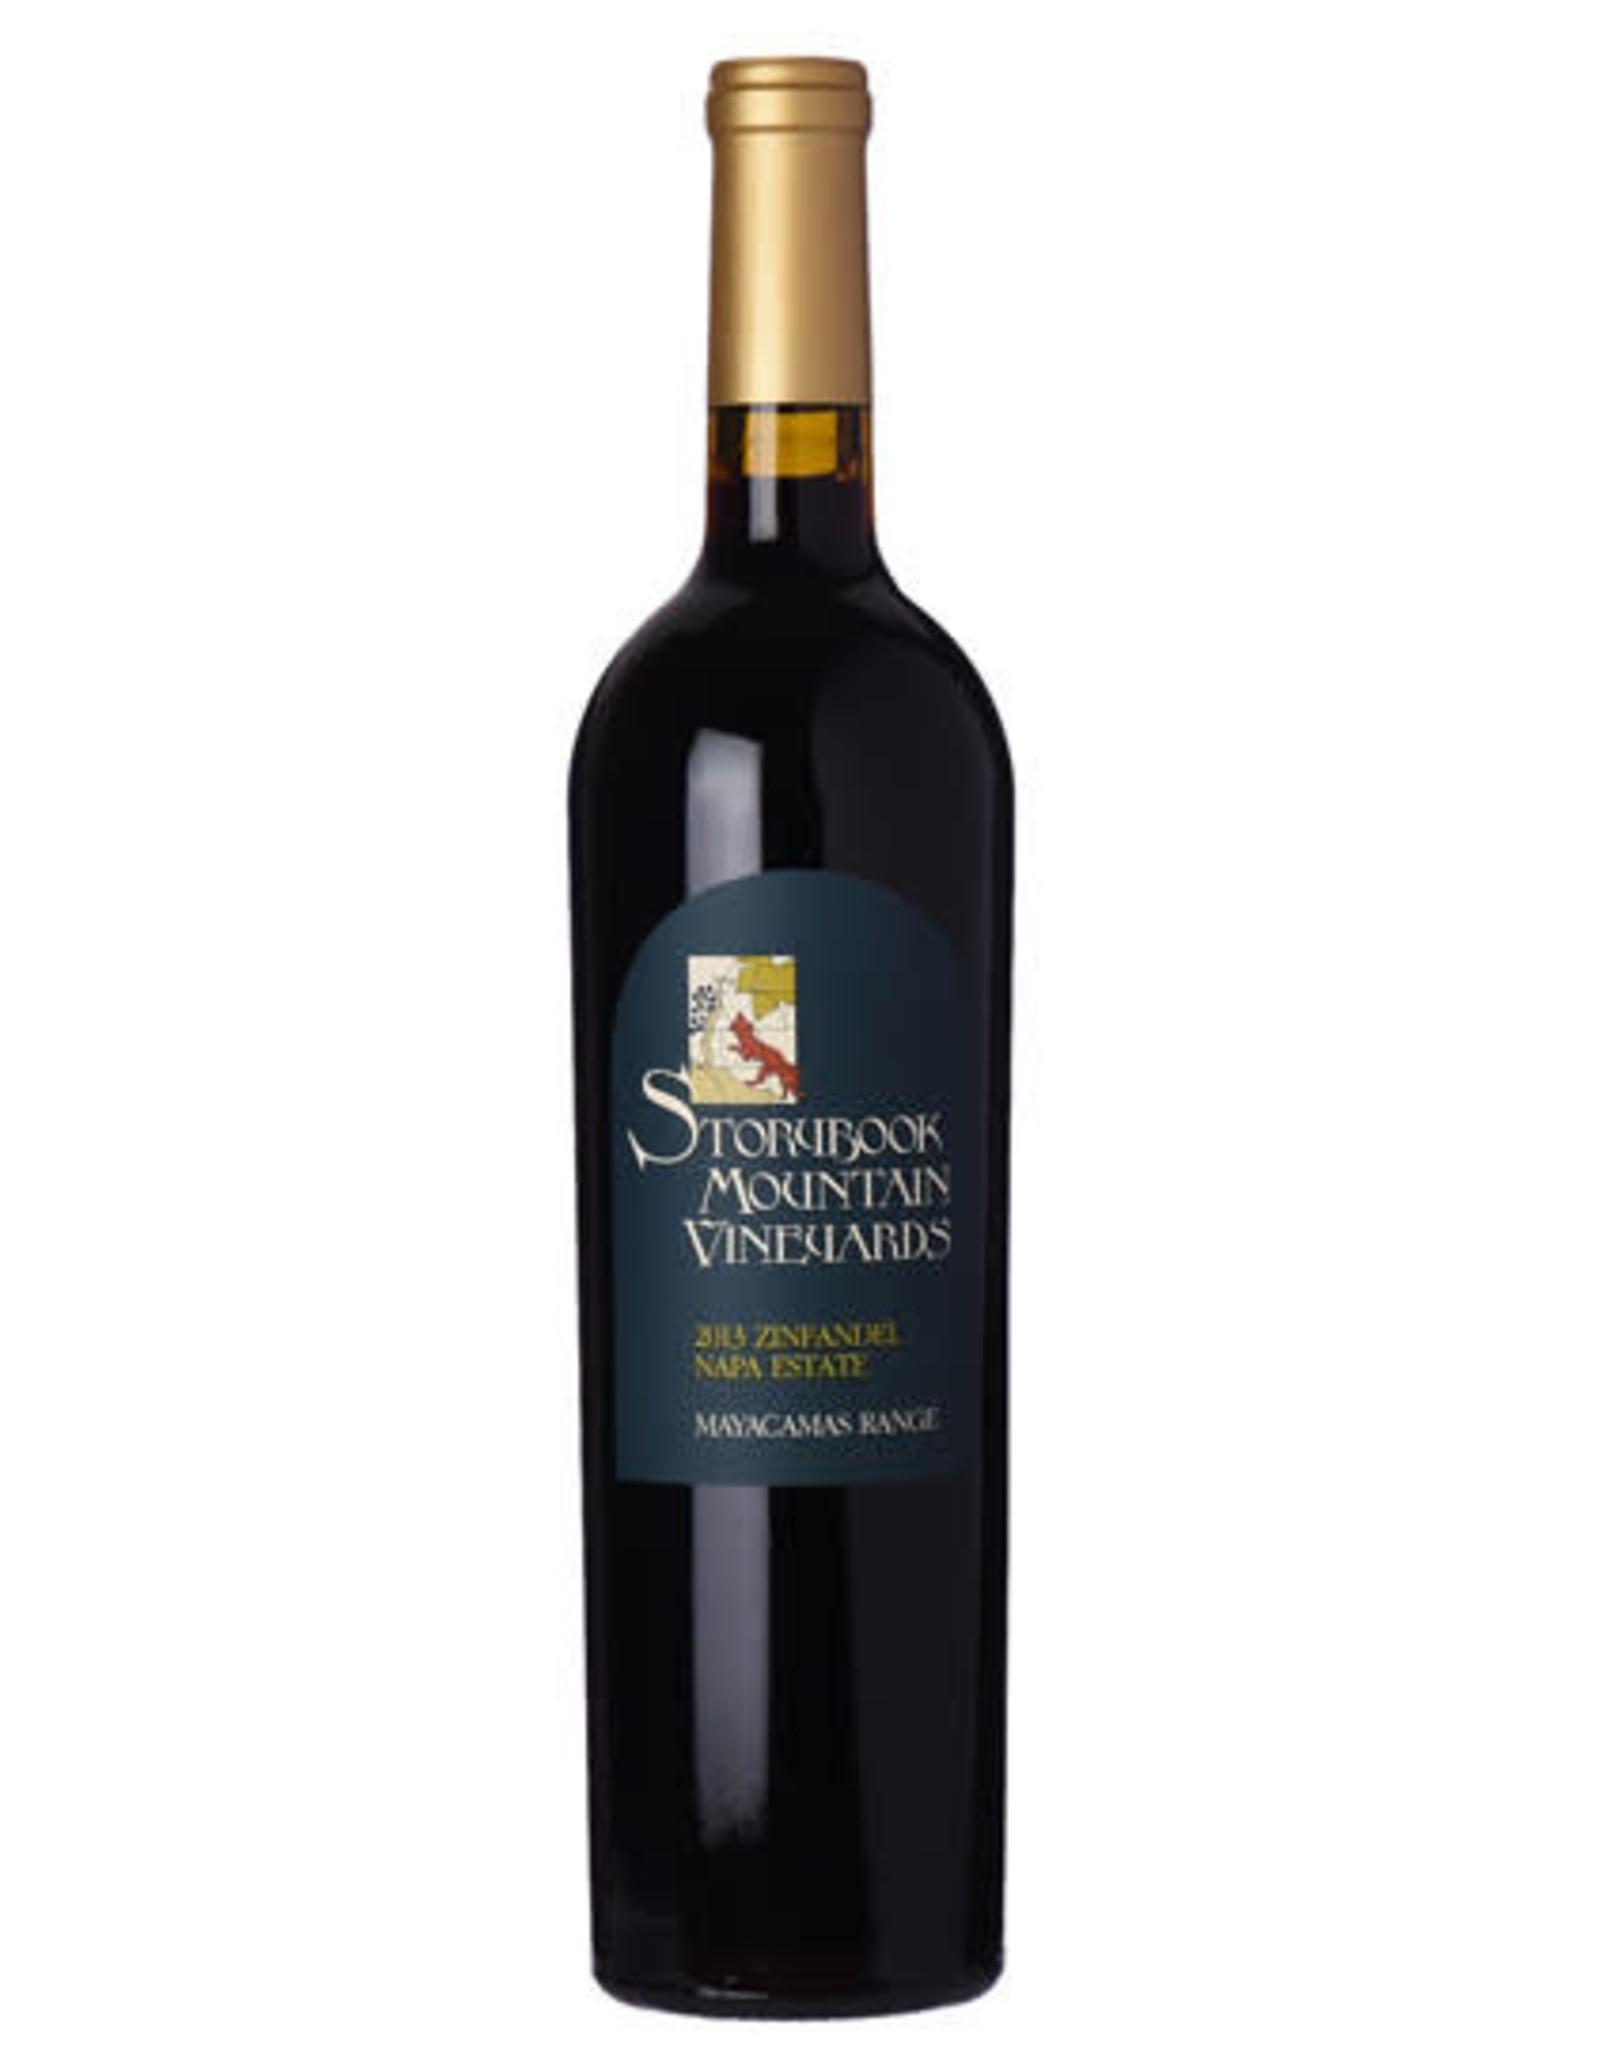 Storybook Mountain Vineyards Zinfandel 2013